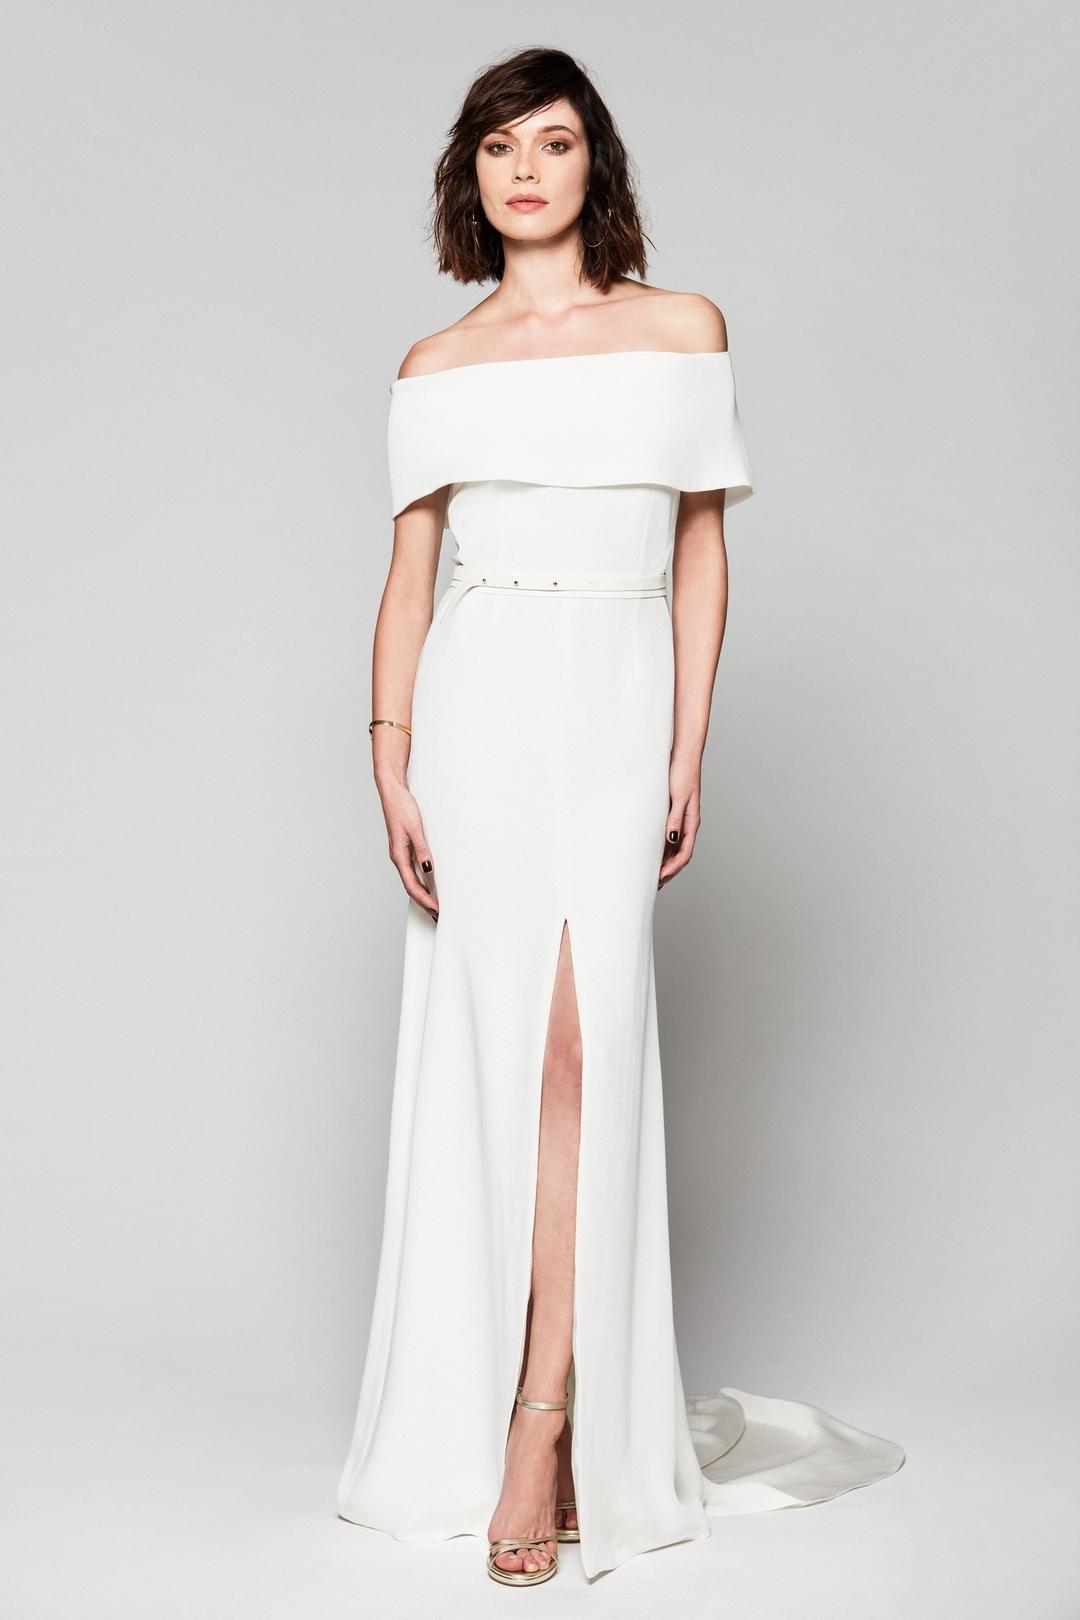 be excellent dress photo